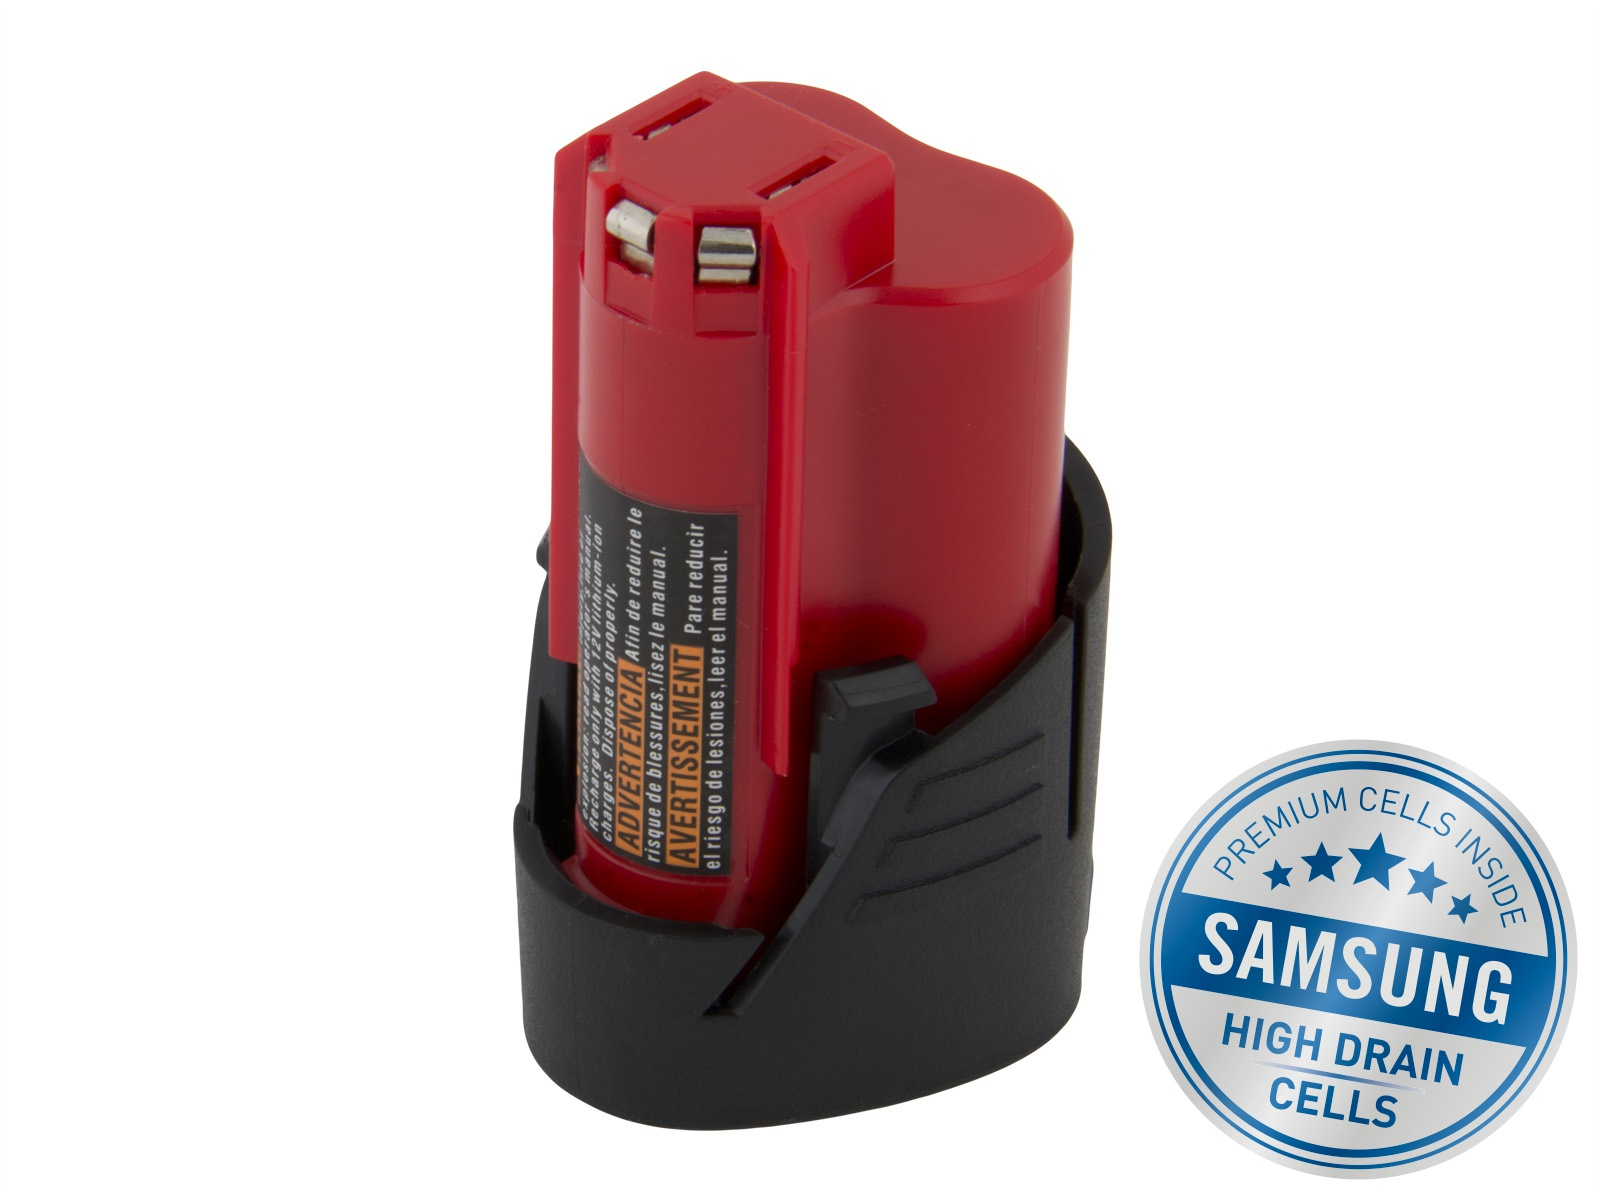 Baterie AVACOM MILWAUKEE C12 B Li-Ion 12V 2000mAh, články SAMSUNG - ATMW-L12A1-20Q